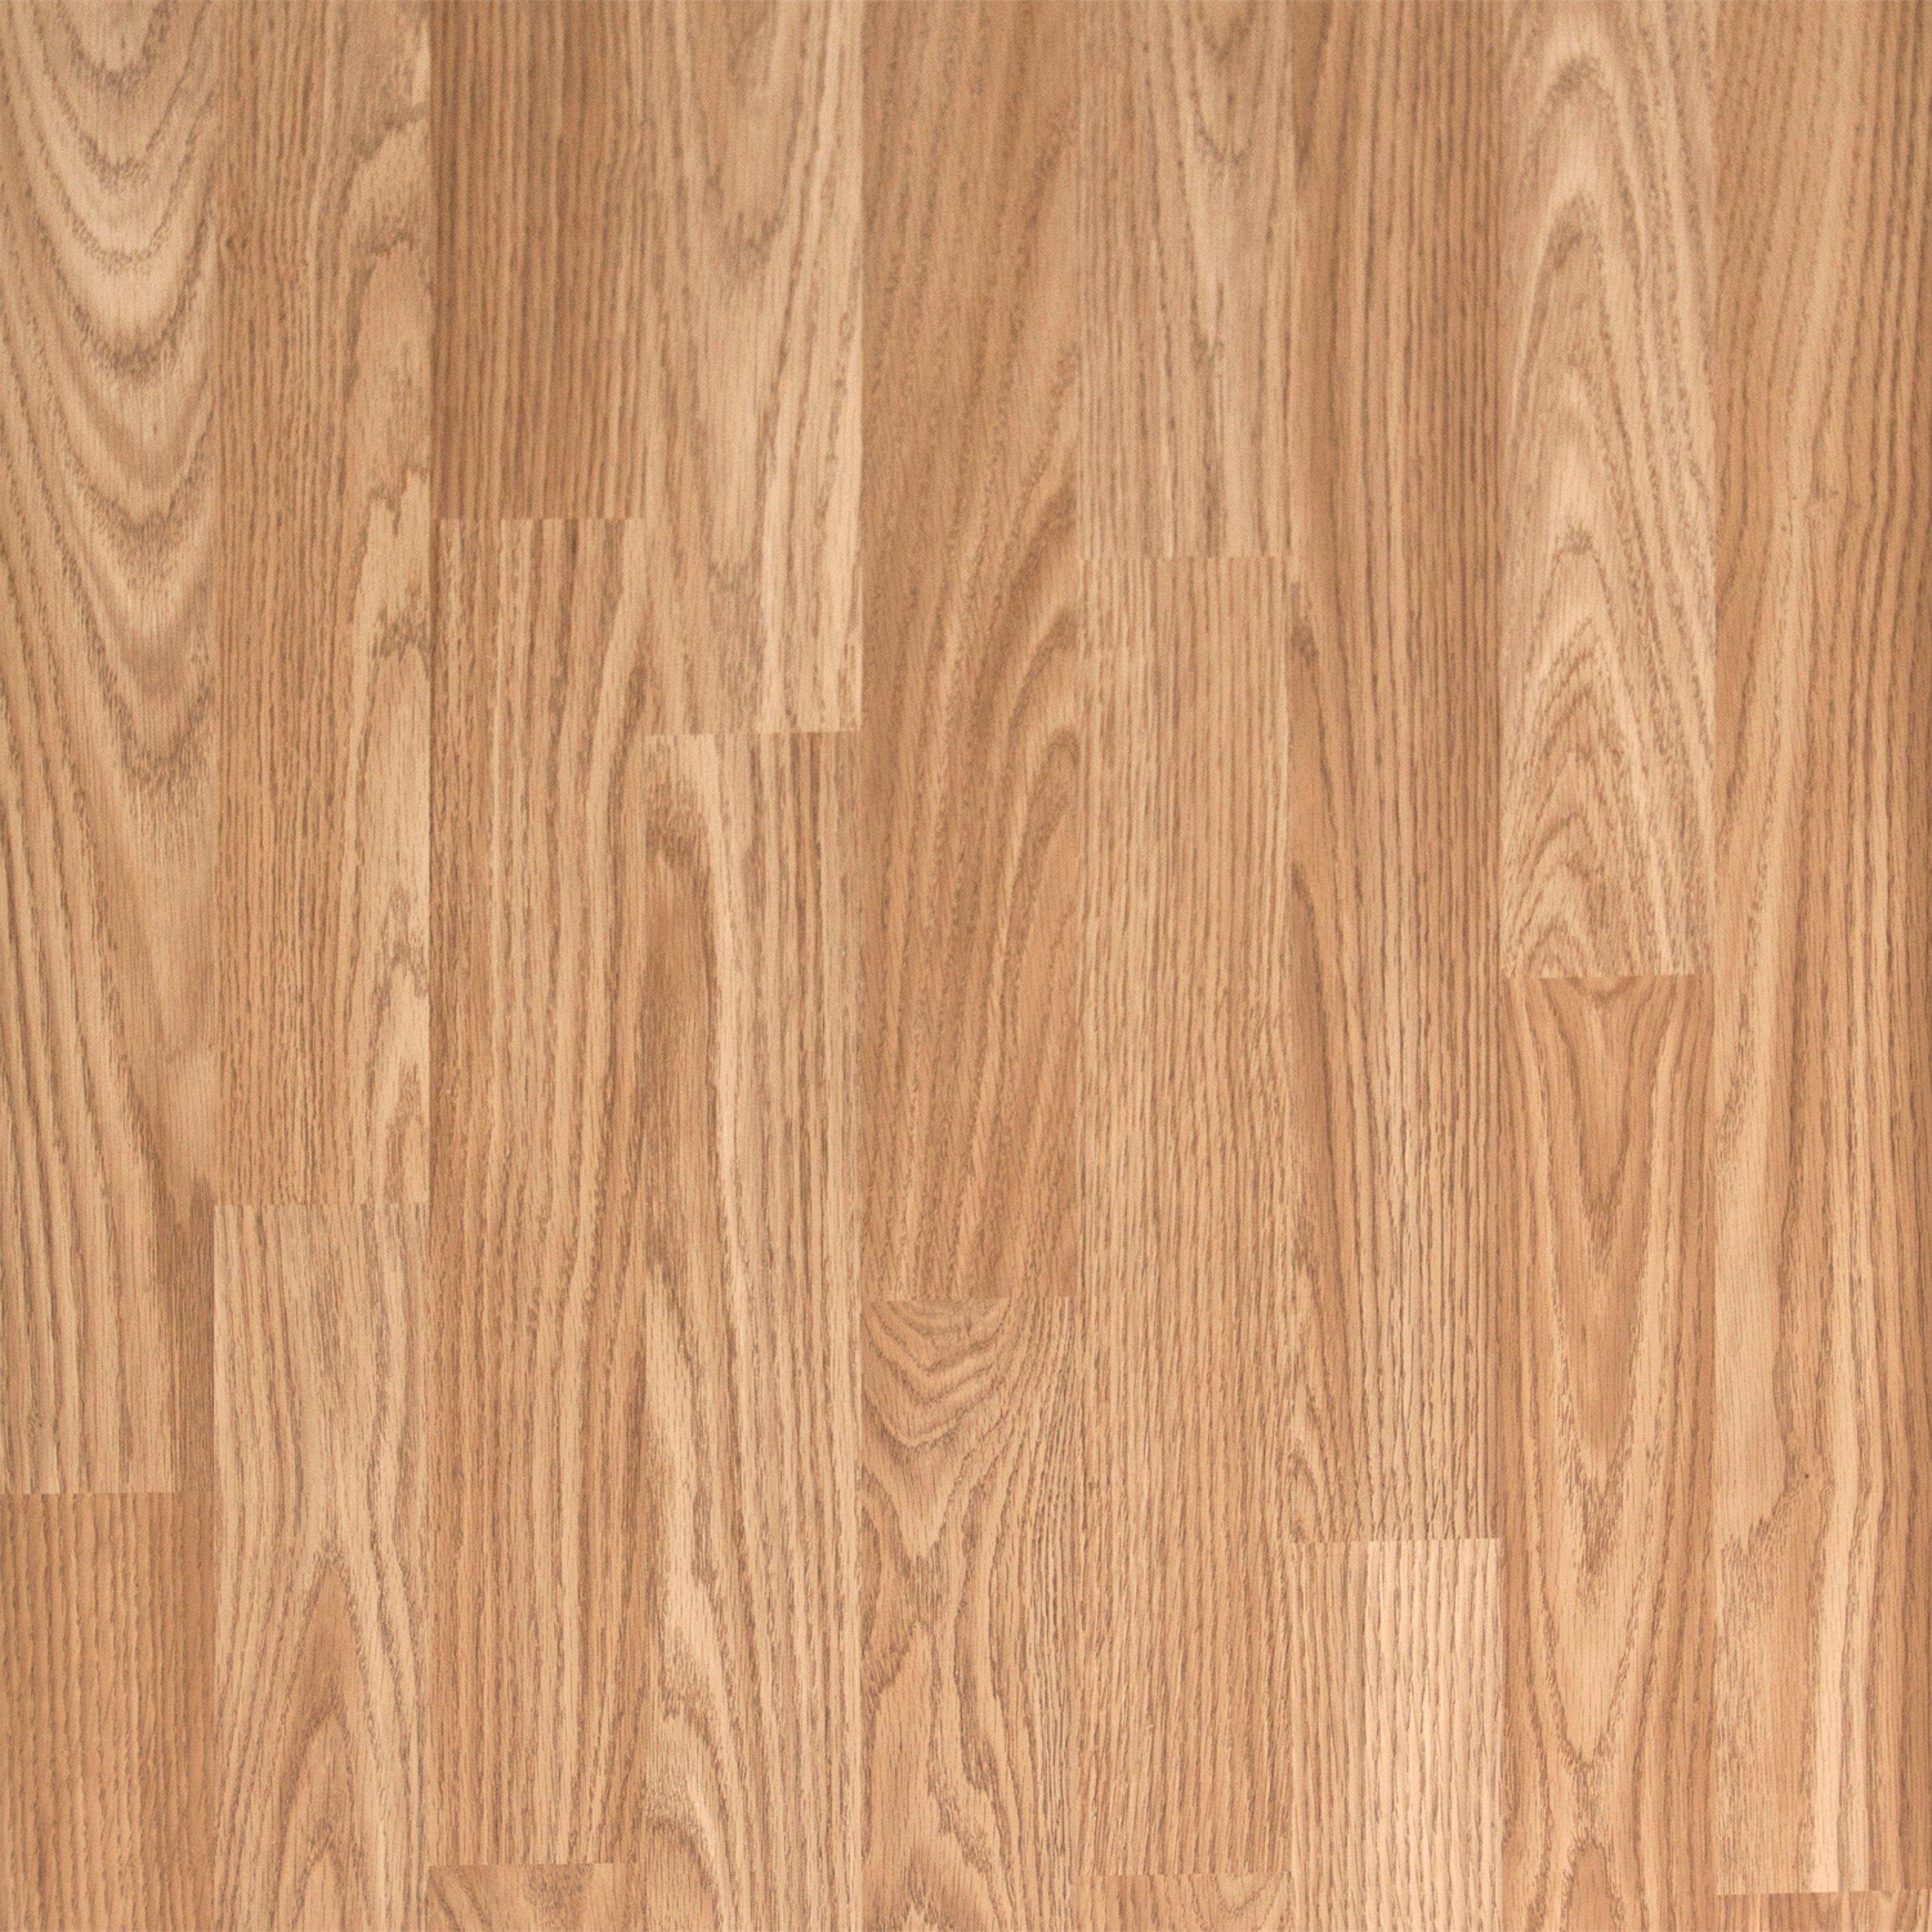 Oak 3 Strip Laminate